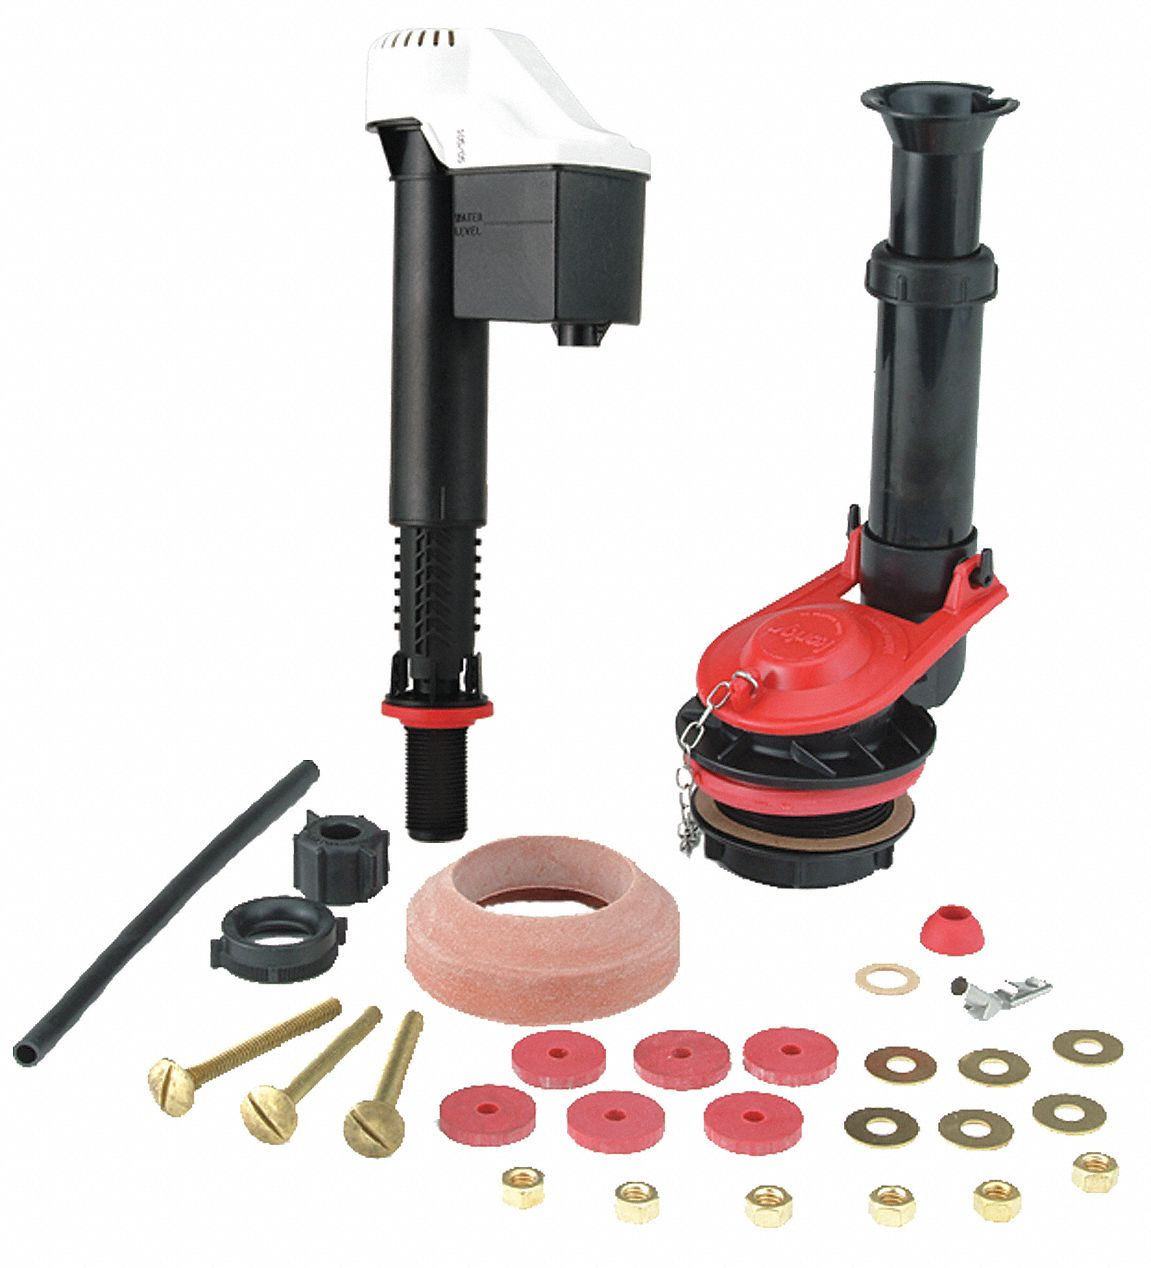 Korky Universal Toilet Repair Kit KORKY 4010PK